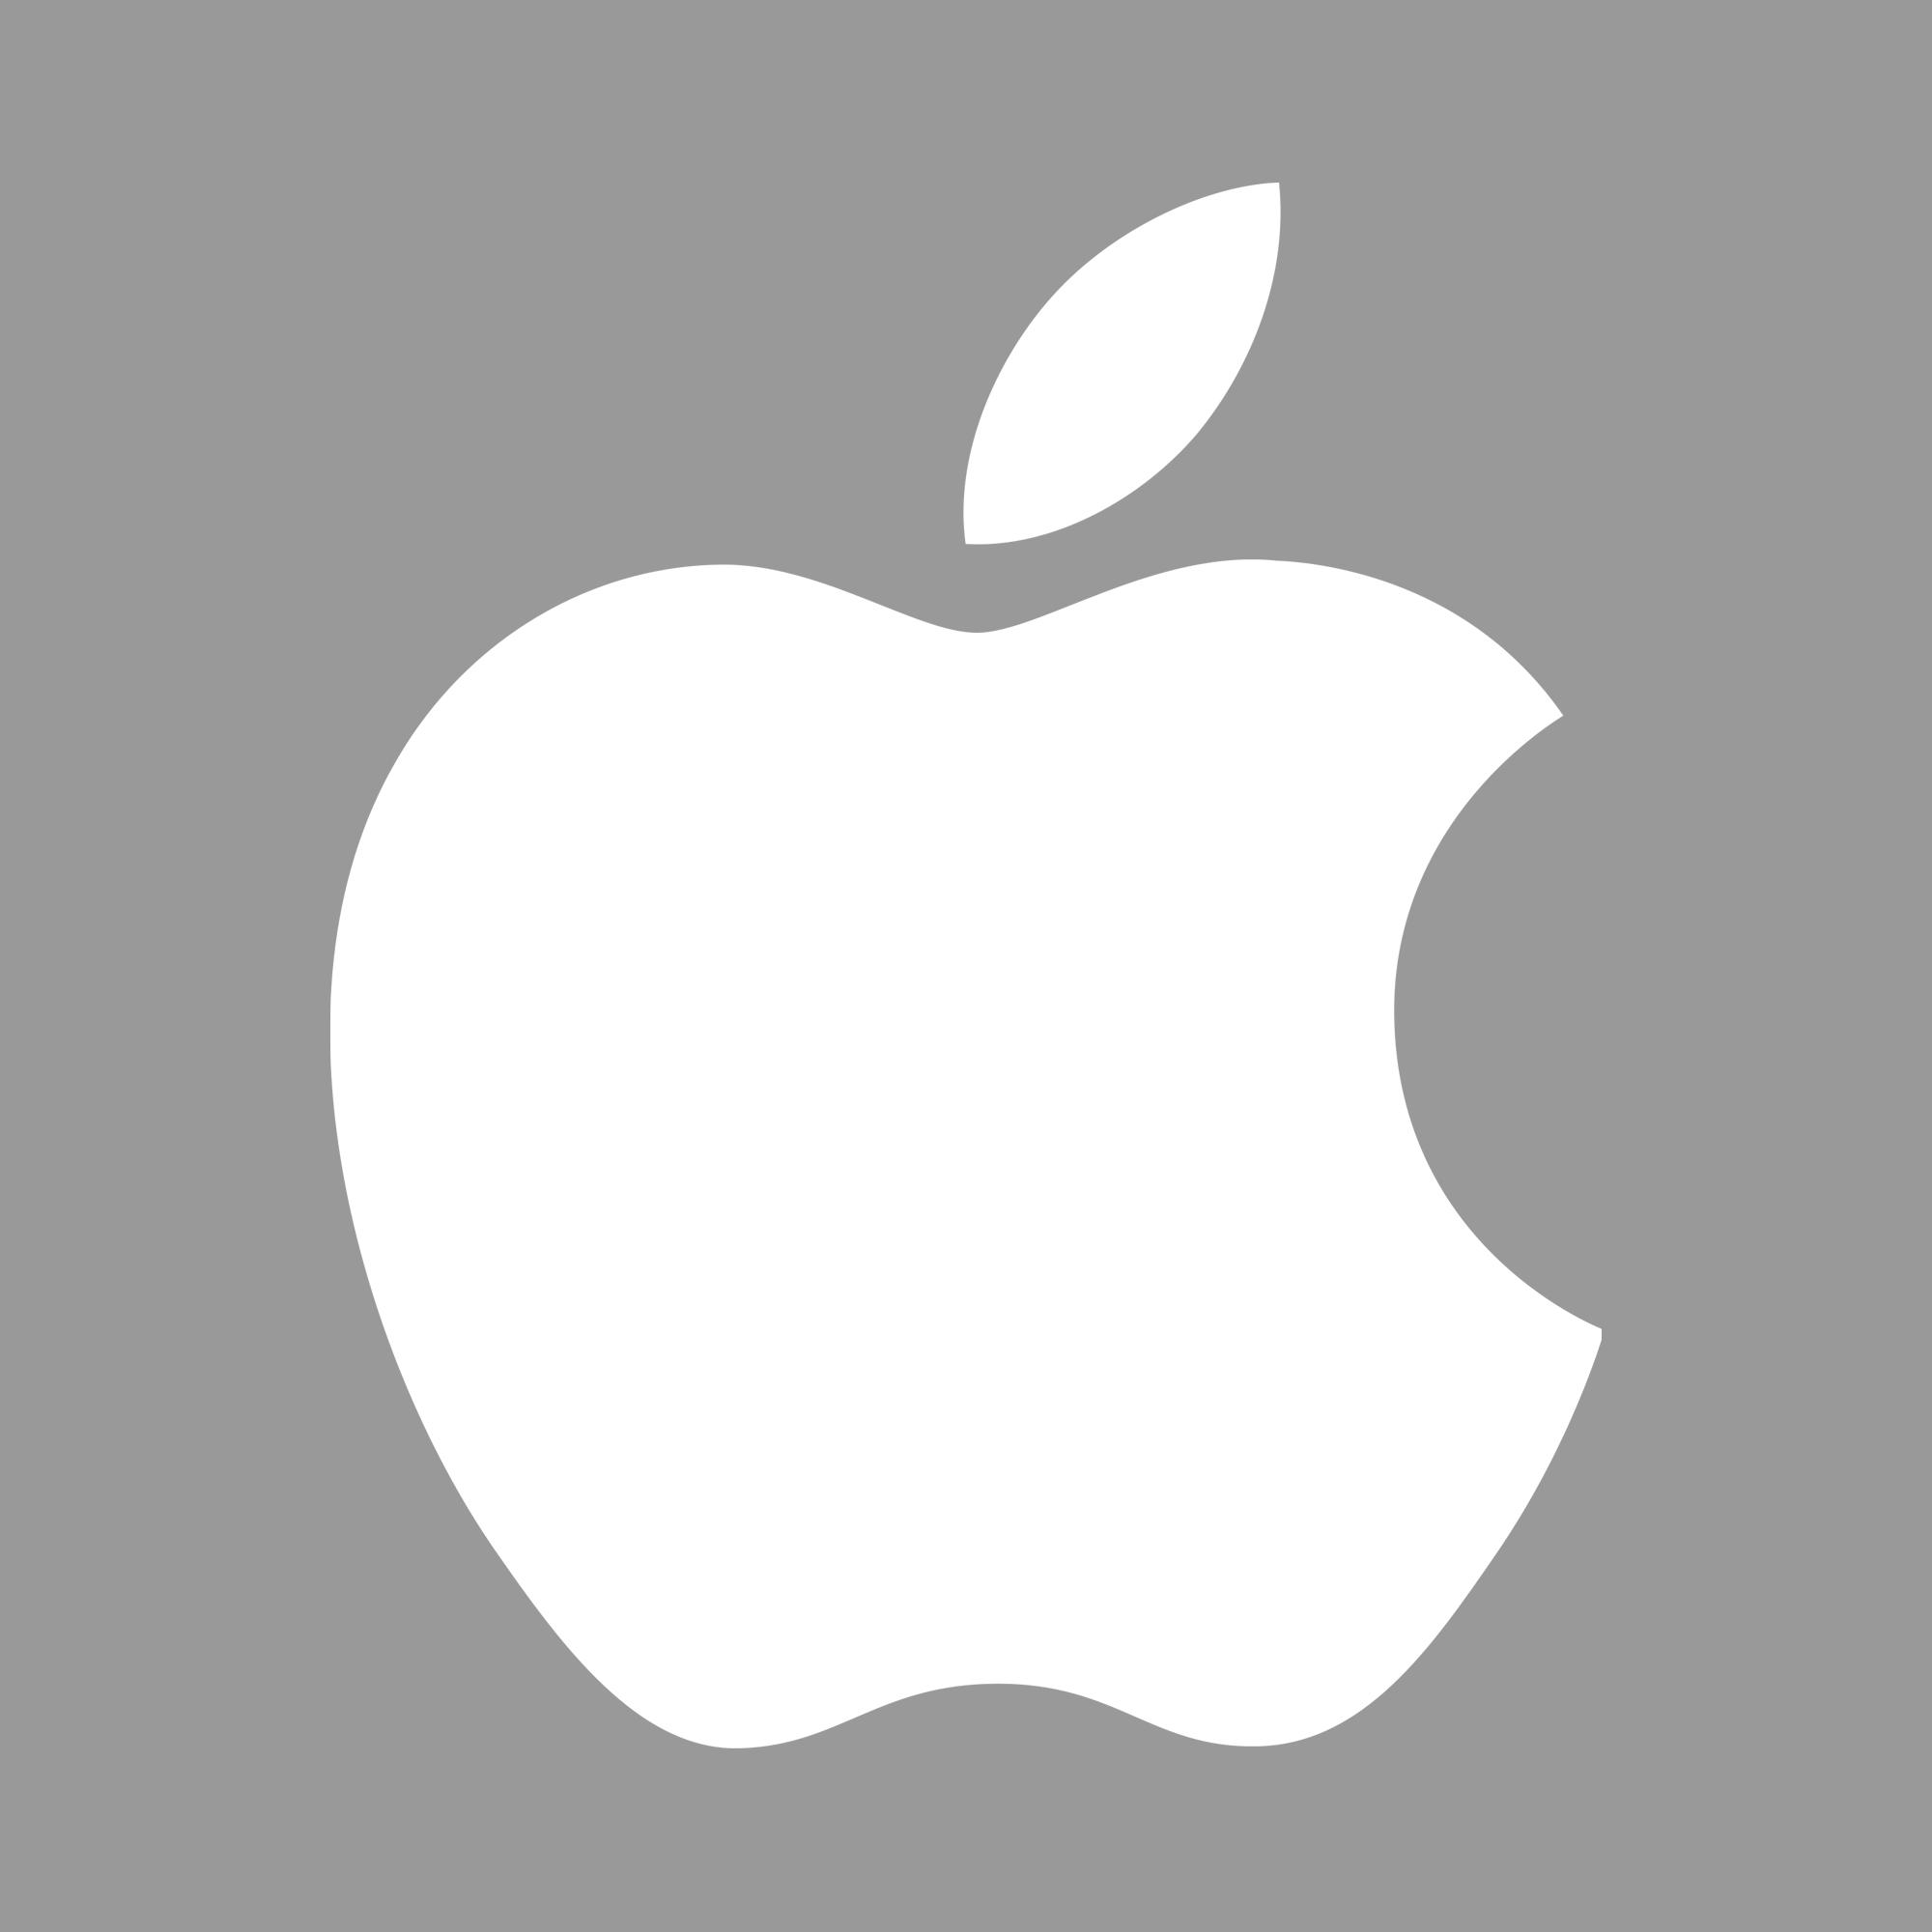 Apple Inc. clipart company logo Back name  the claimed